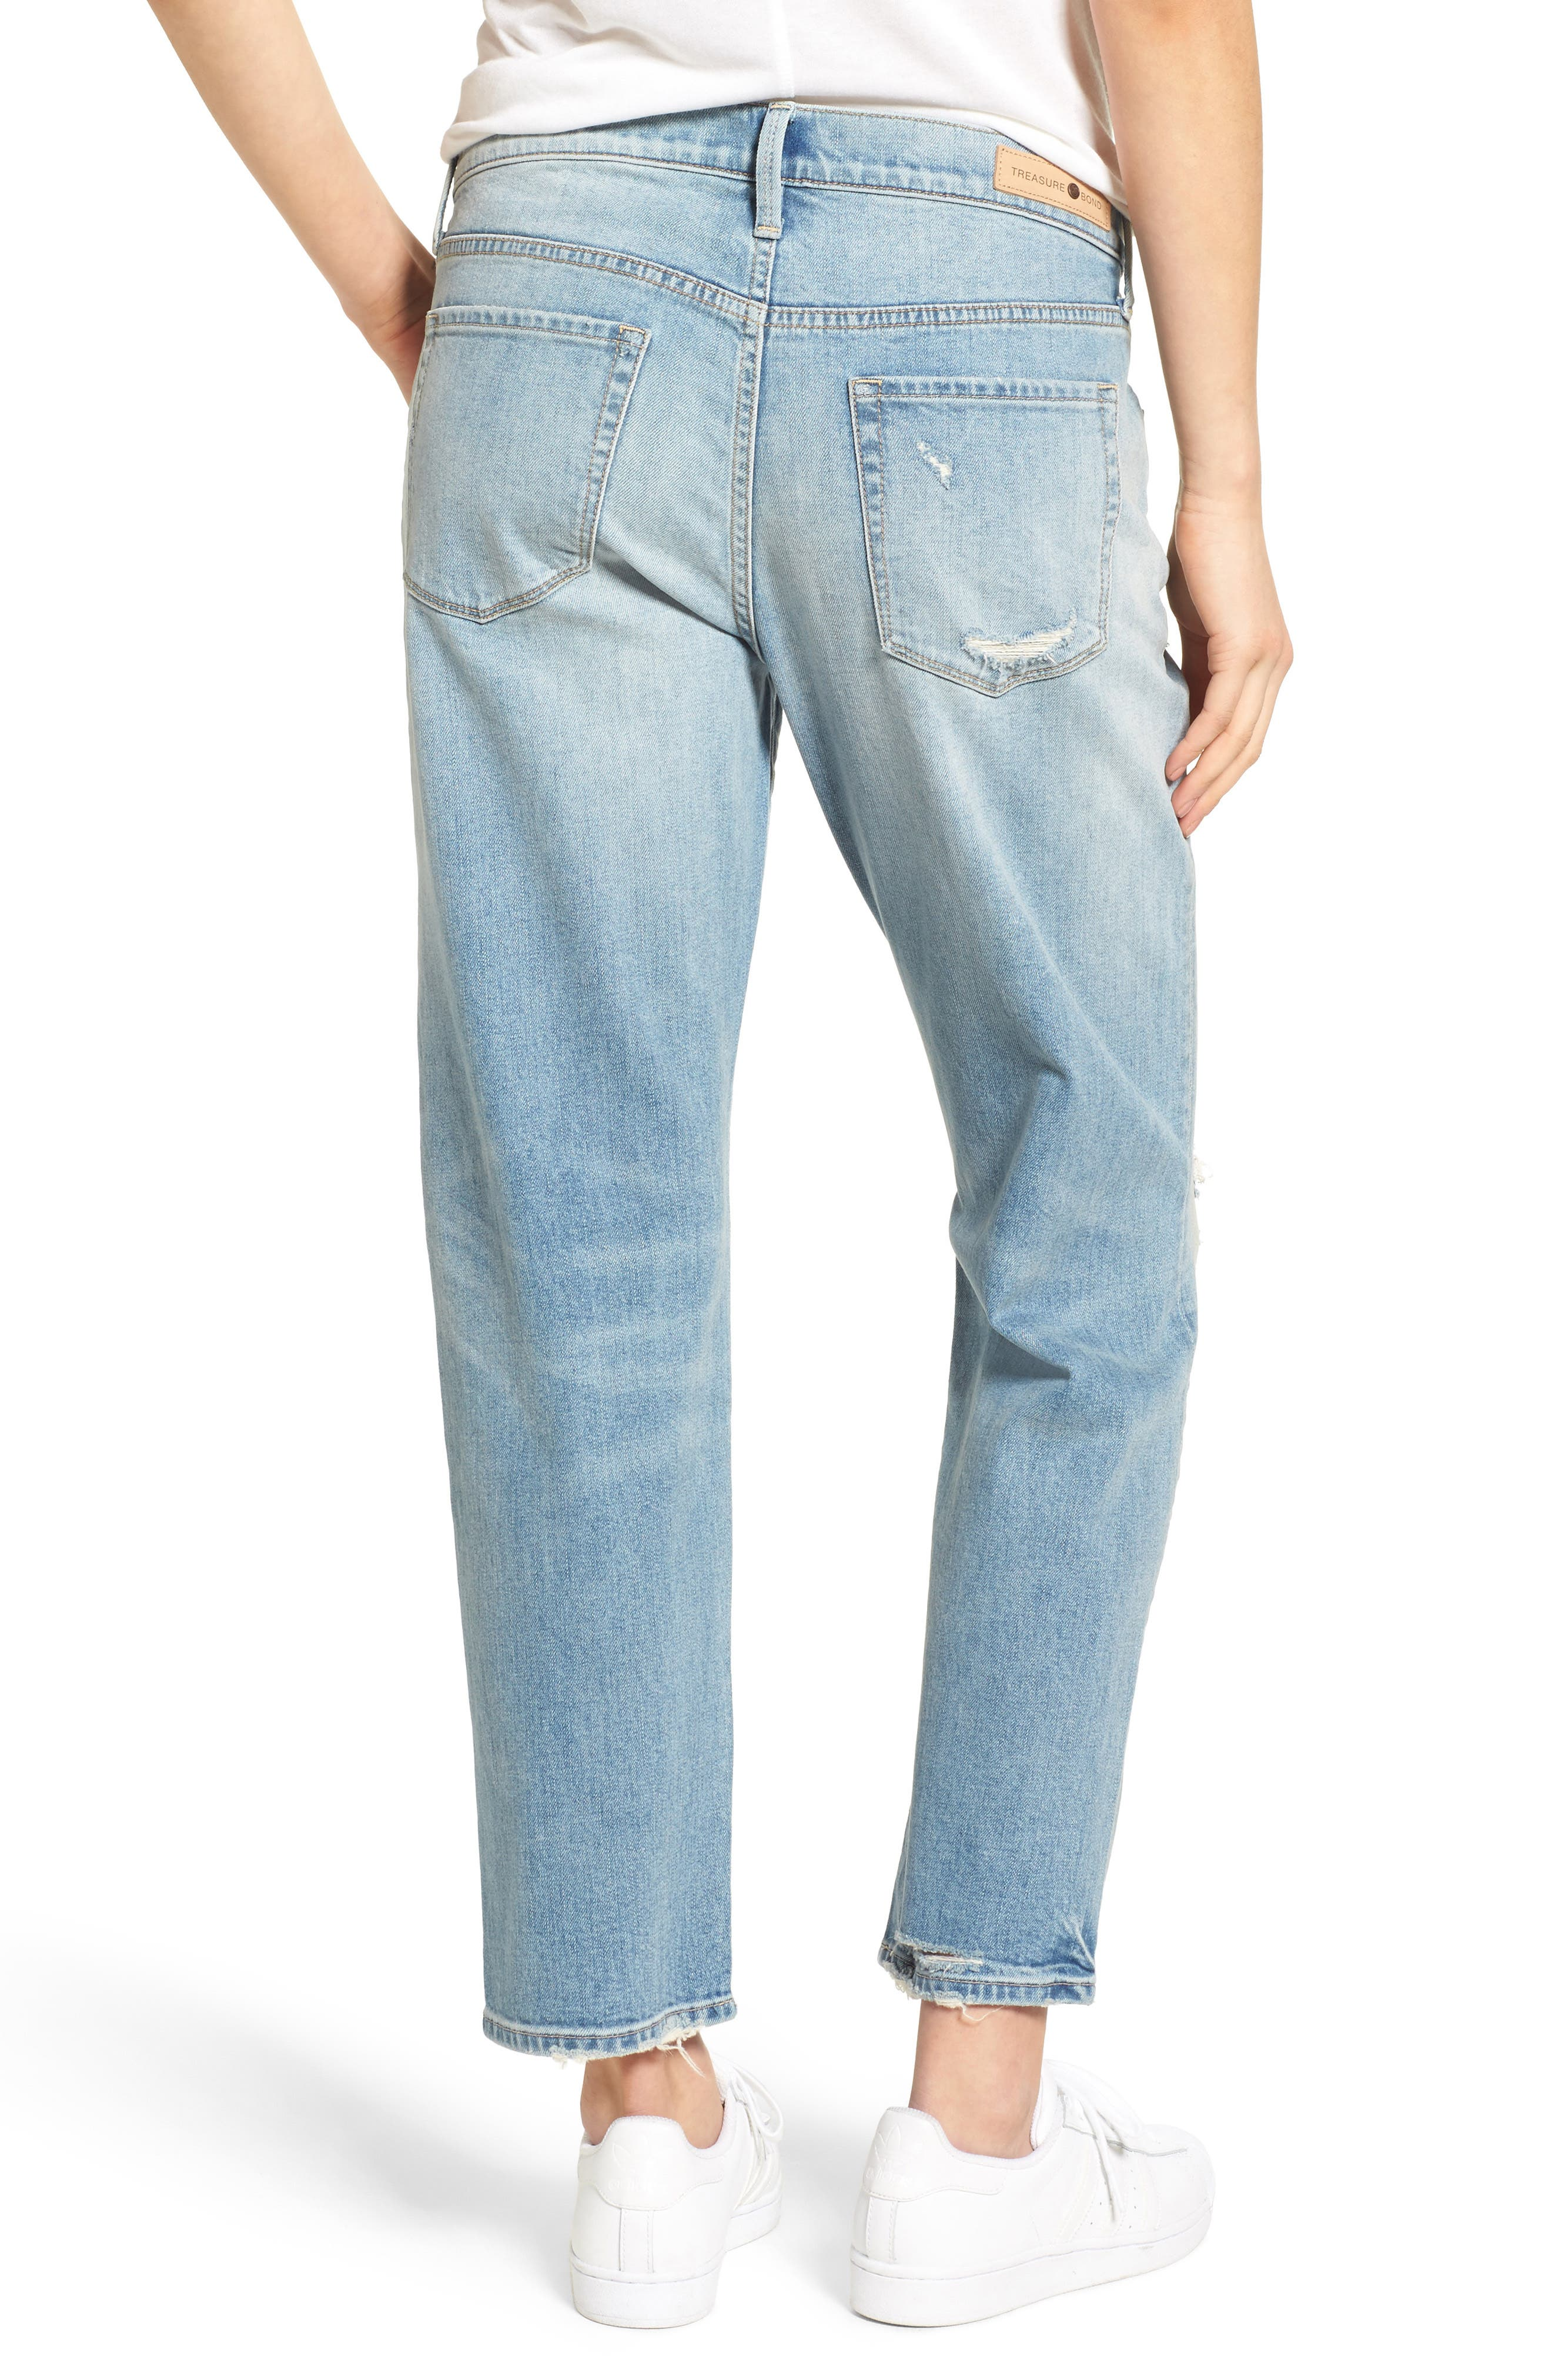 TREASURE & BOND,                             Boyfriend Jeans,                             Alternate thumbnail 2, color,                             400